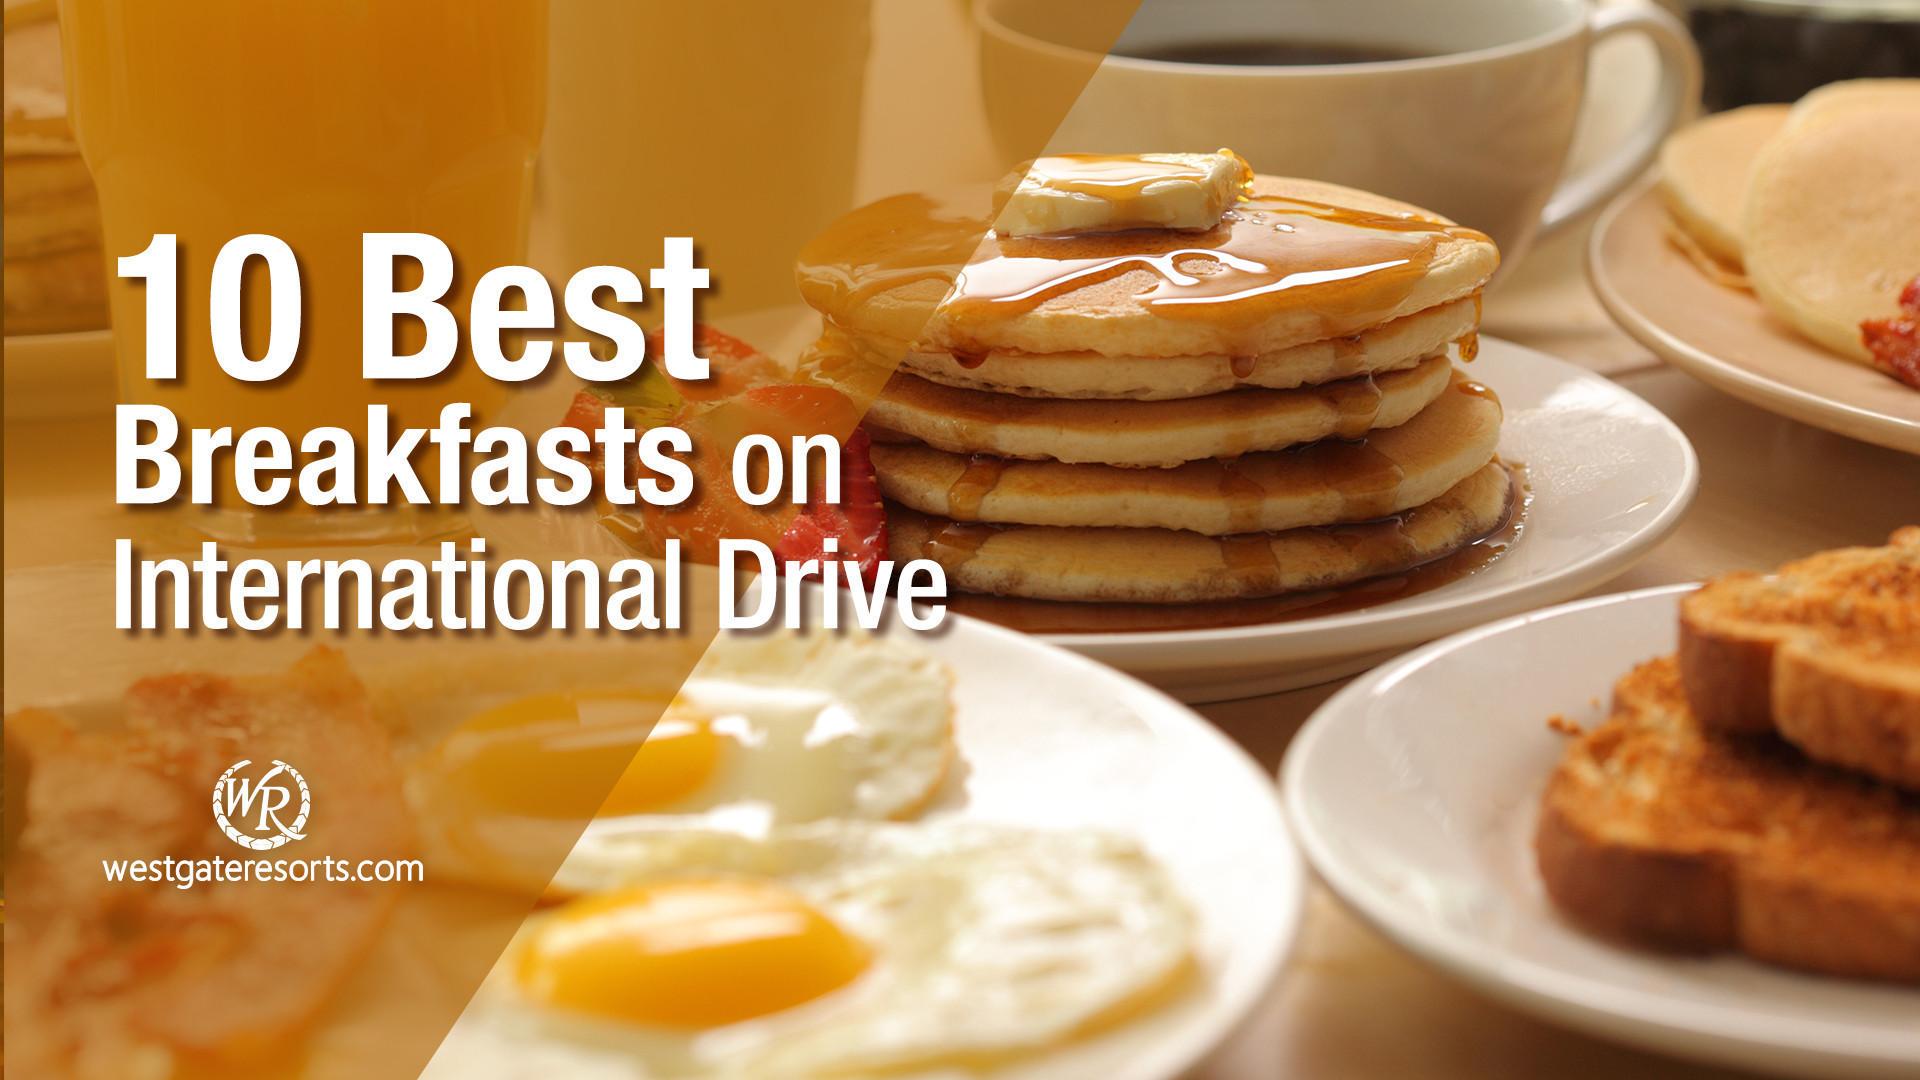 10 Best Breakfasts in Orlando on International Drive | I Drive Breakfast Guide For Orlando